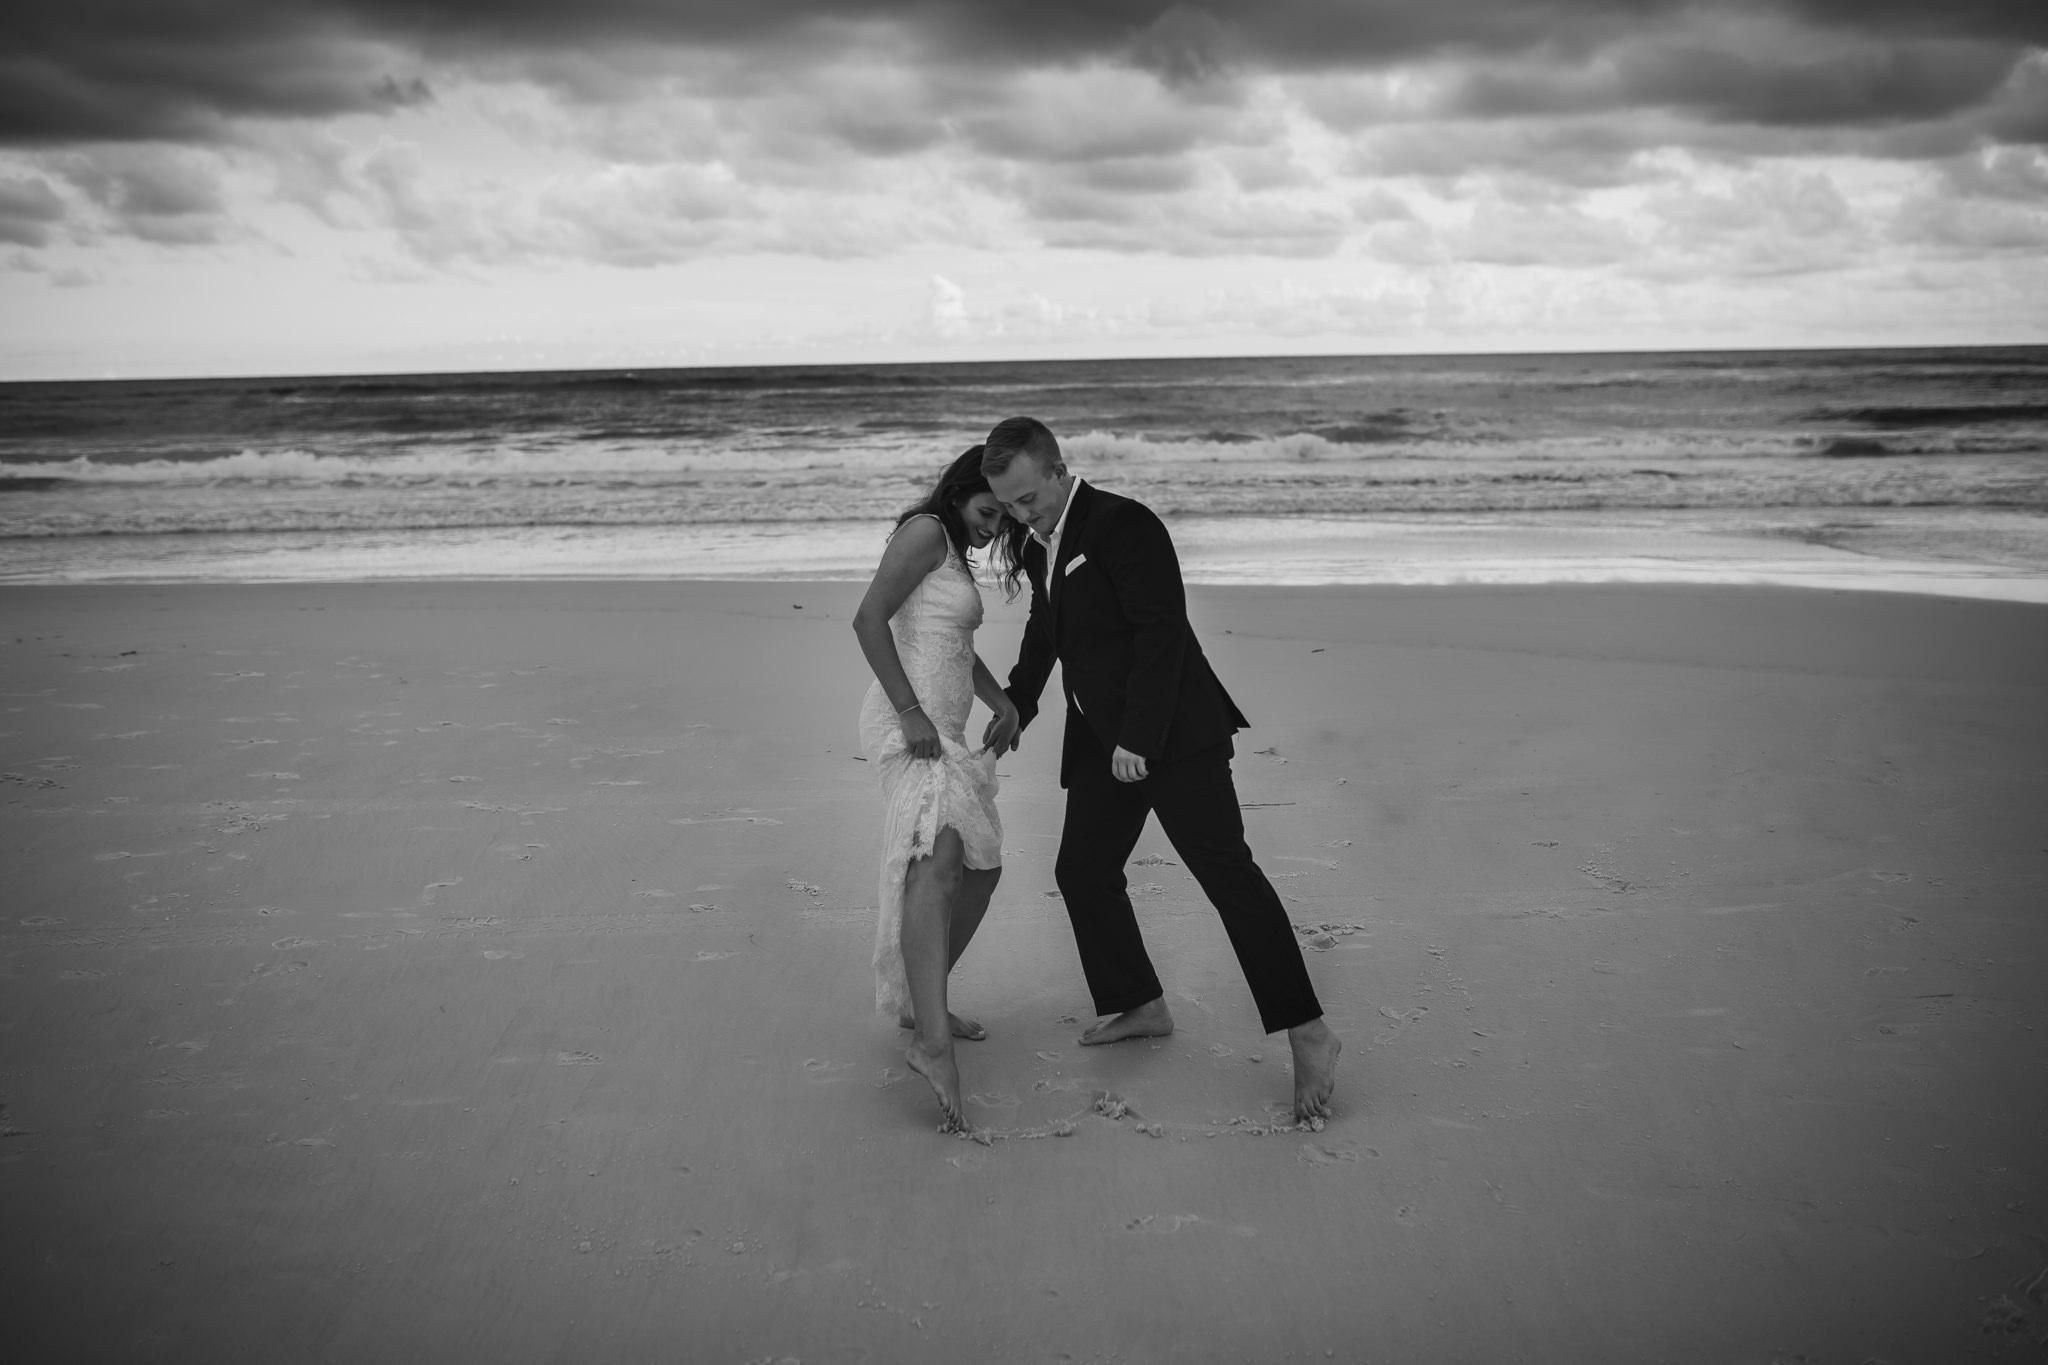 cassie-cook-photography-santa-rosa-beach-wedding-farrar-wedding-34.jpg